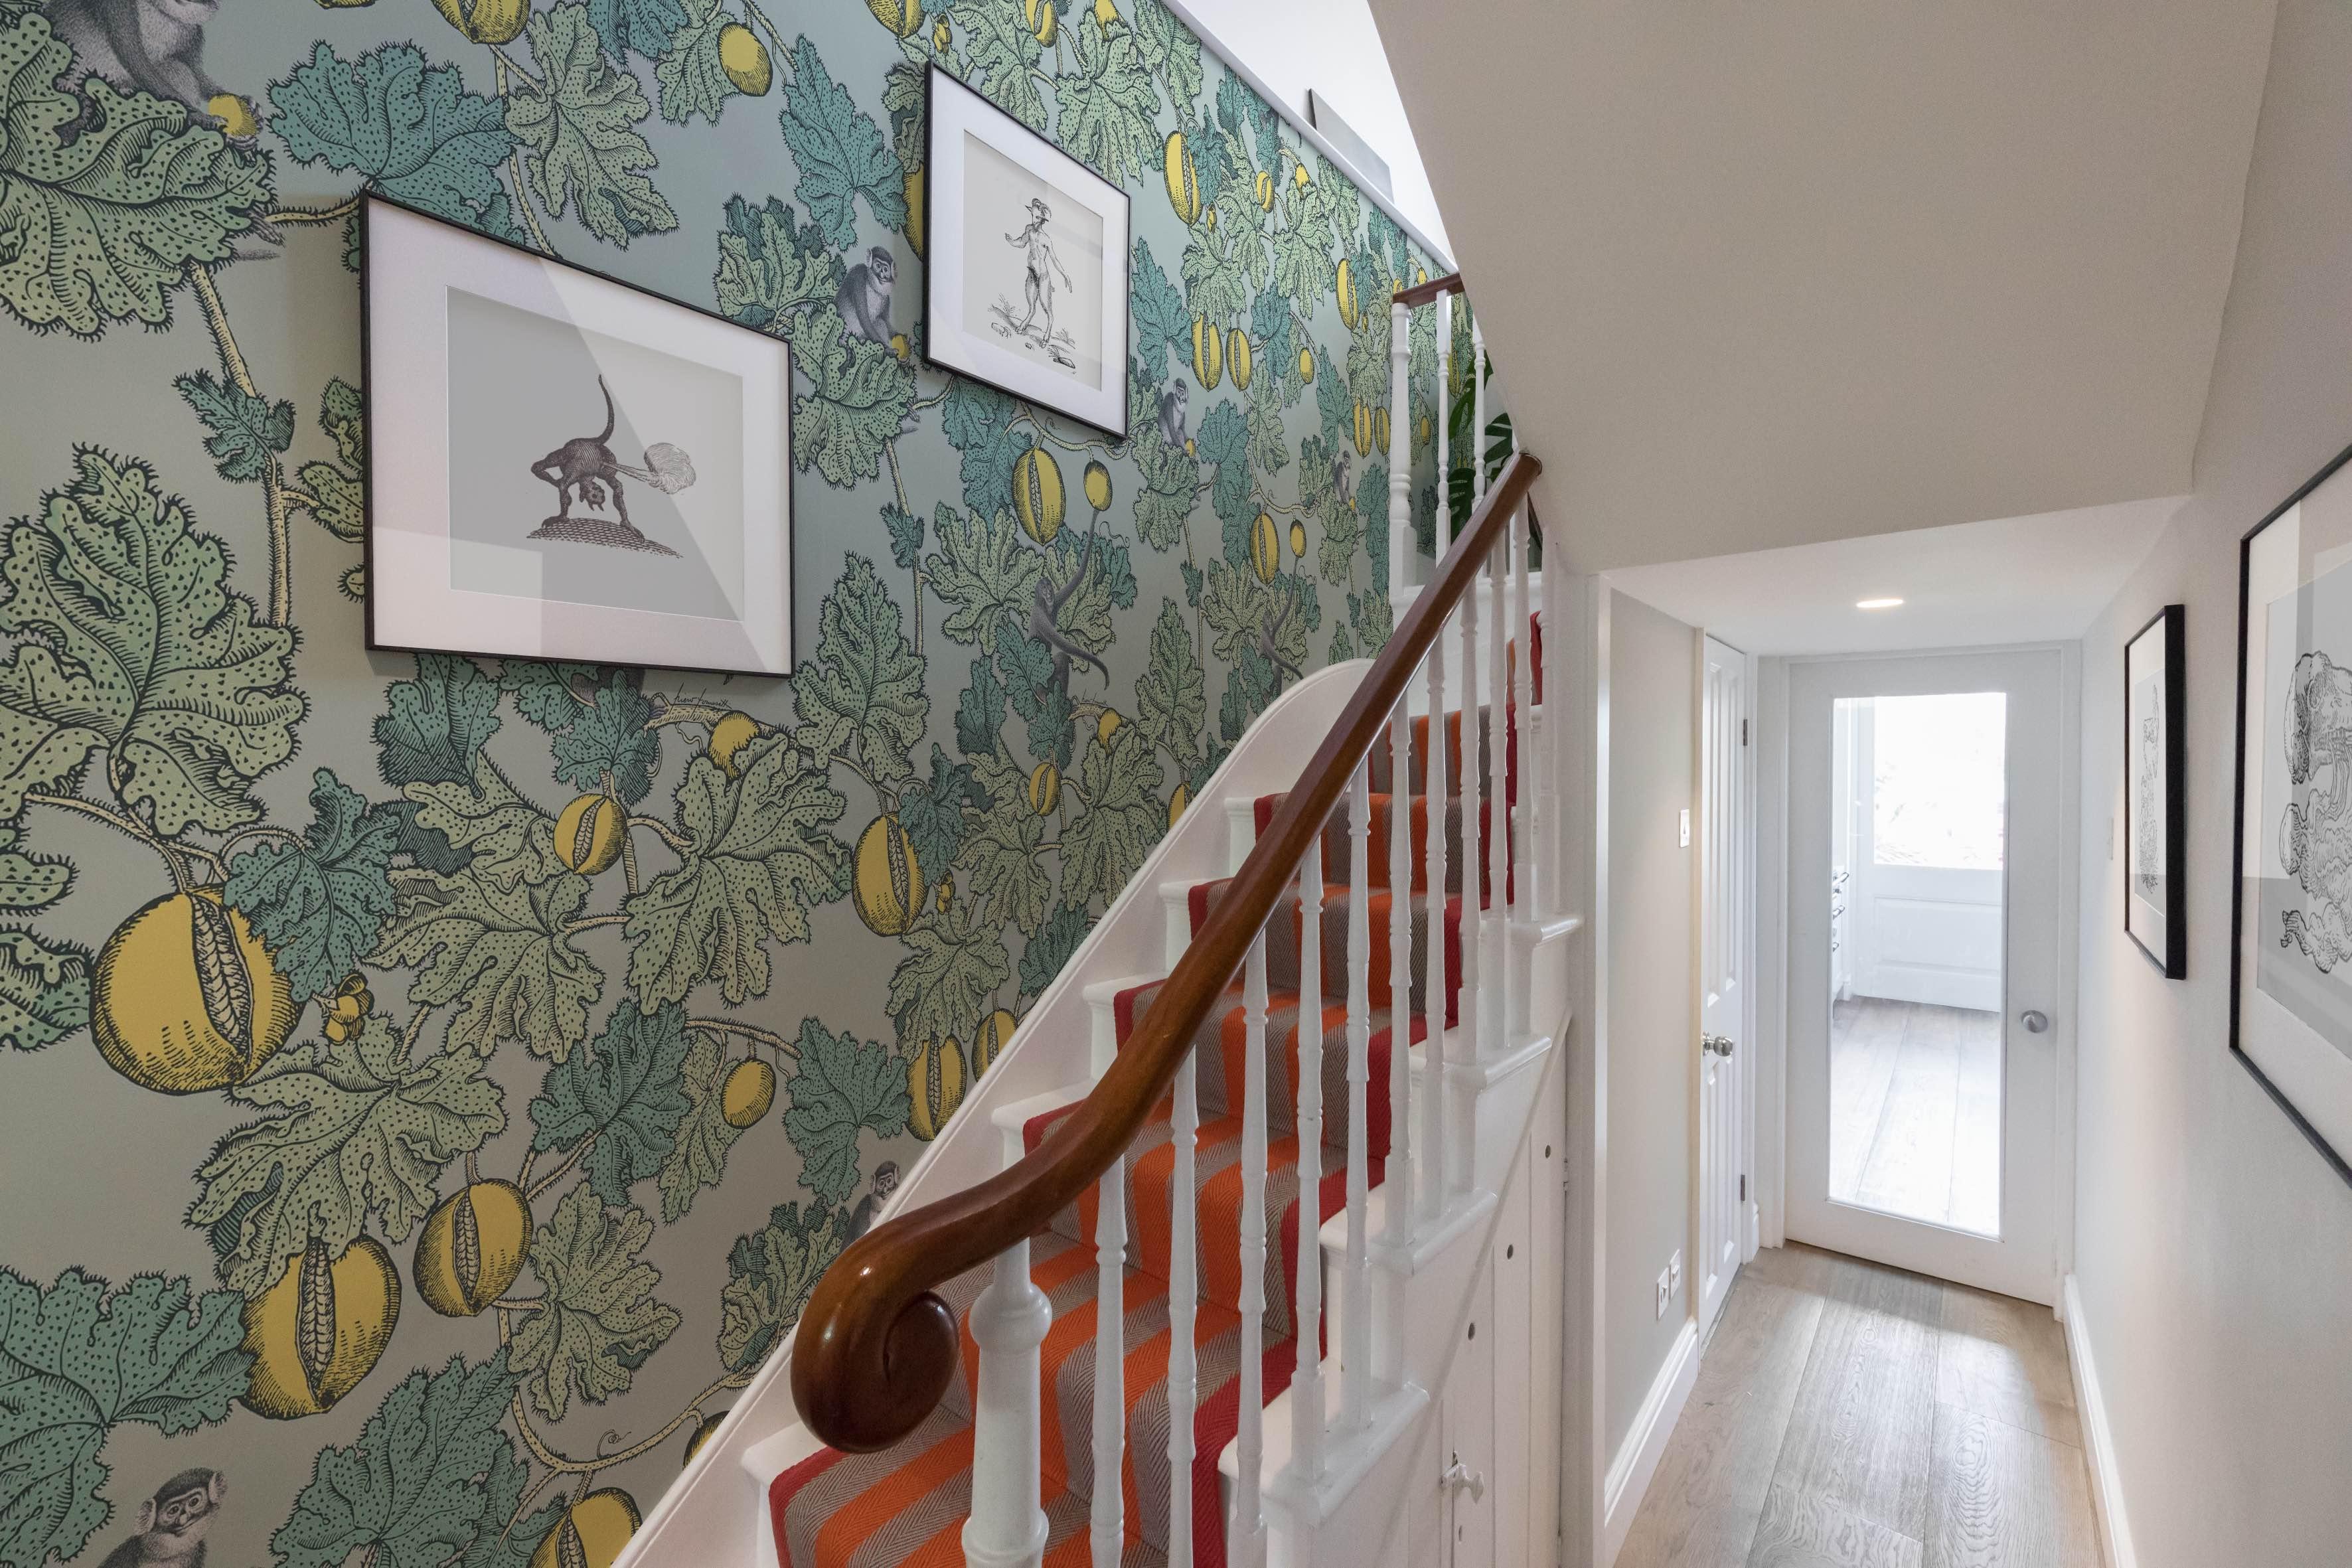 Orange stair runner with green wallpaper